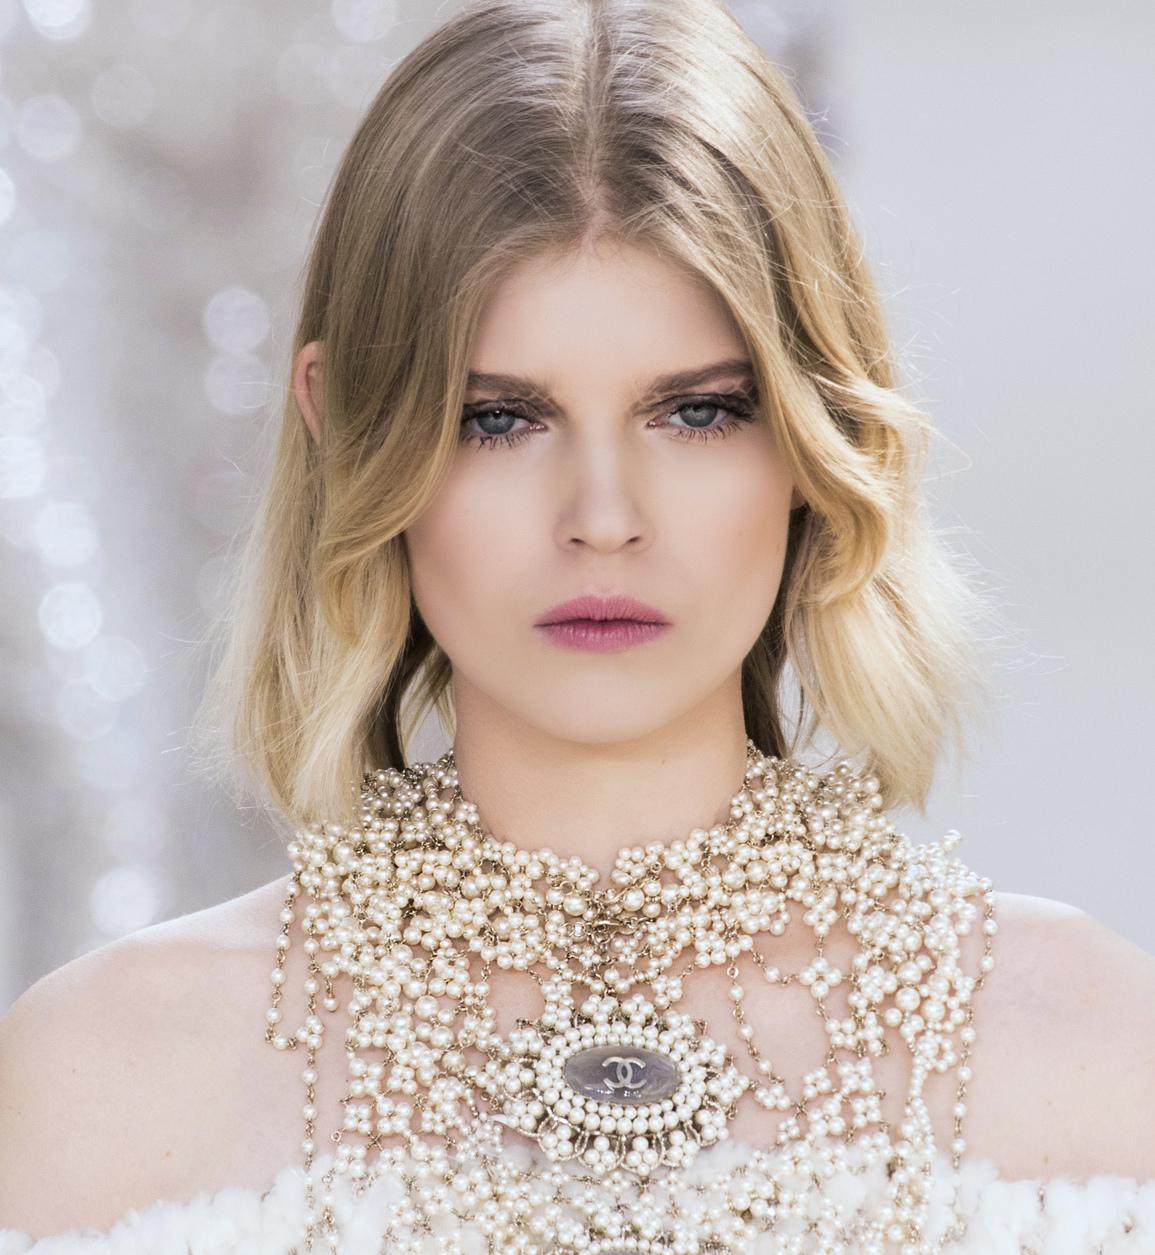 Fryzury Slubne 2016 2017 Elle Wedding Trendy Wiosna Lato 2020